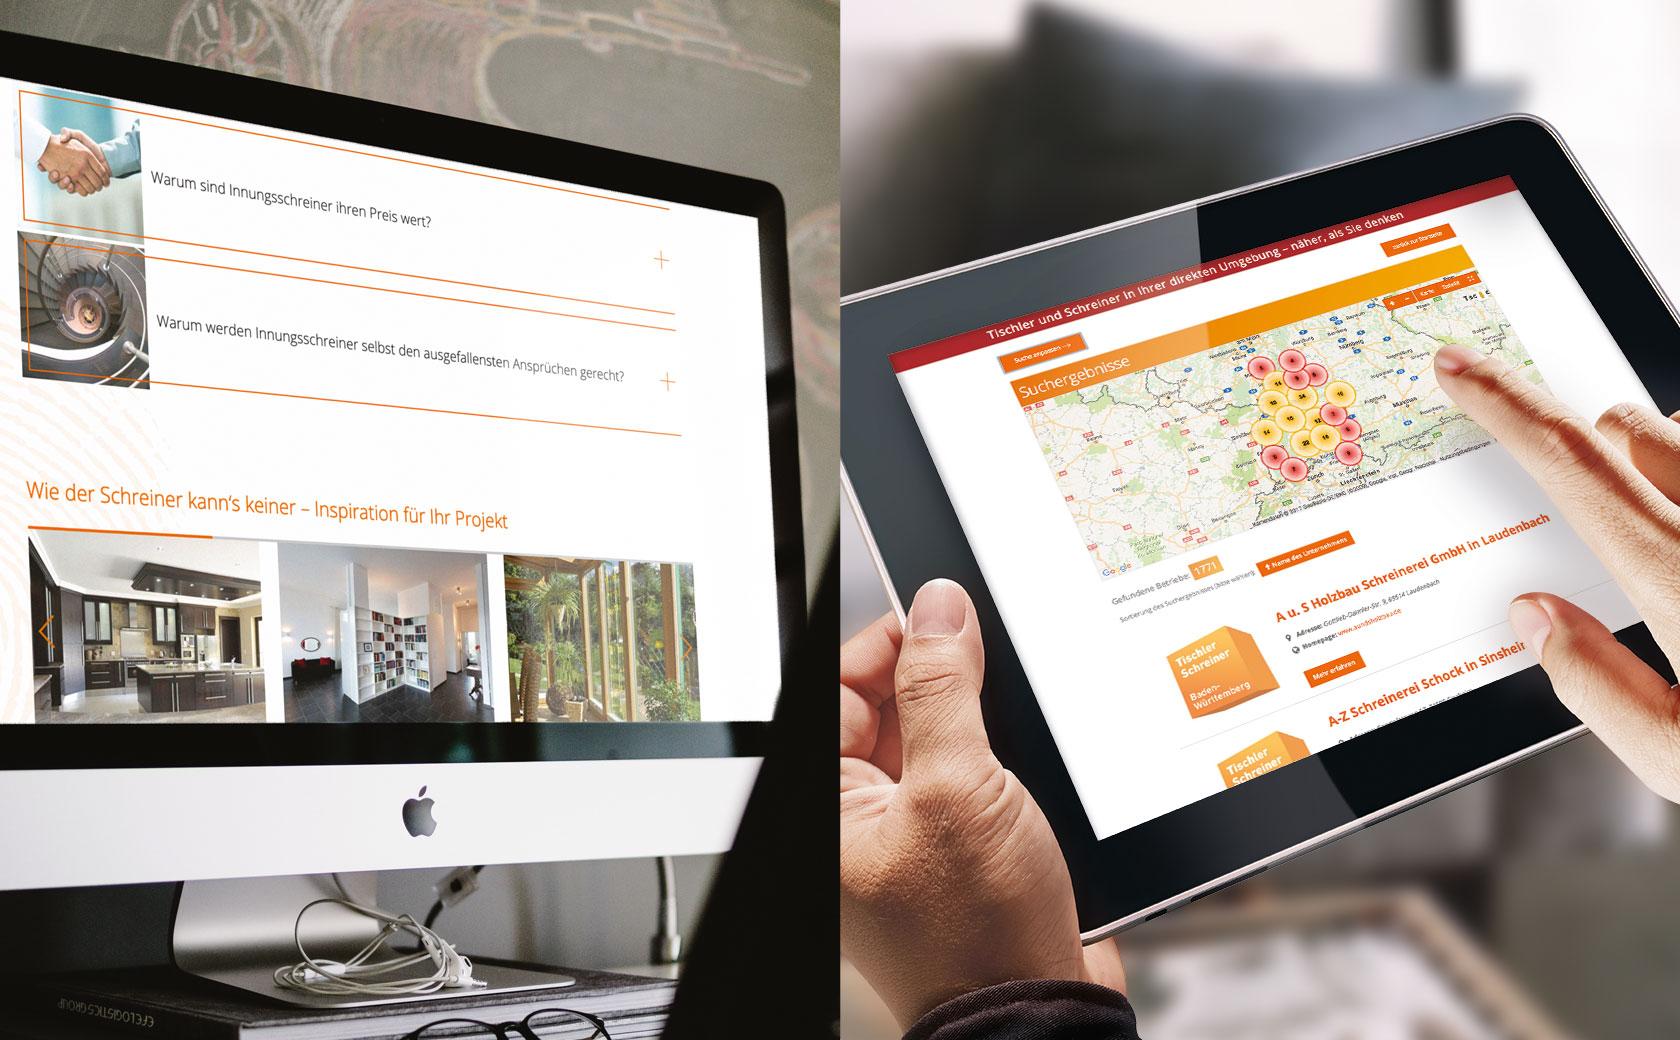 Landingpage Schreiner finden Desktop Tablet